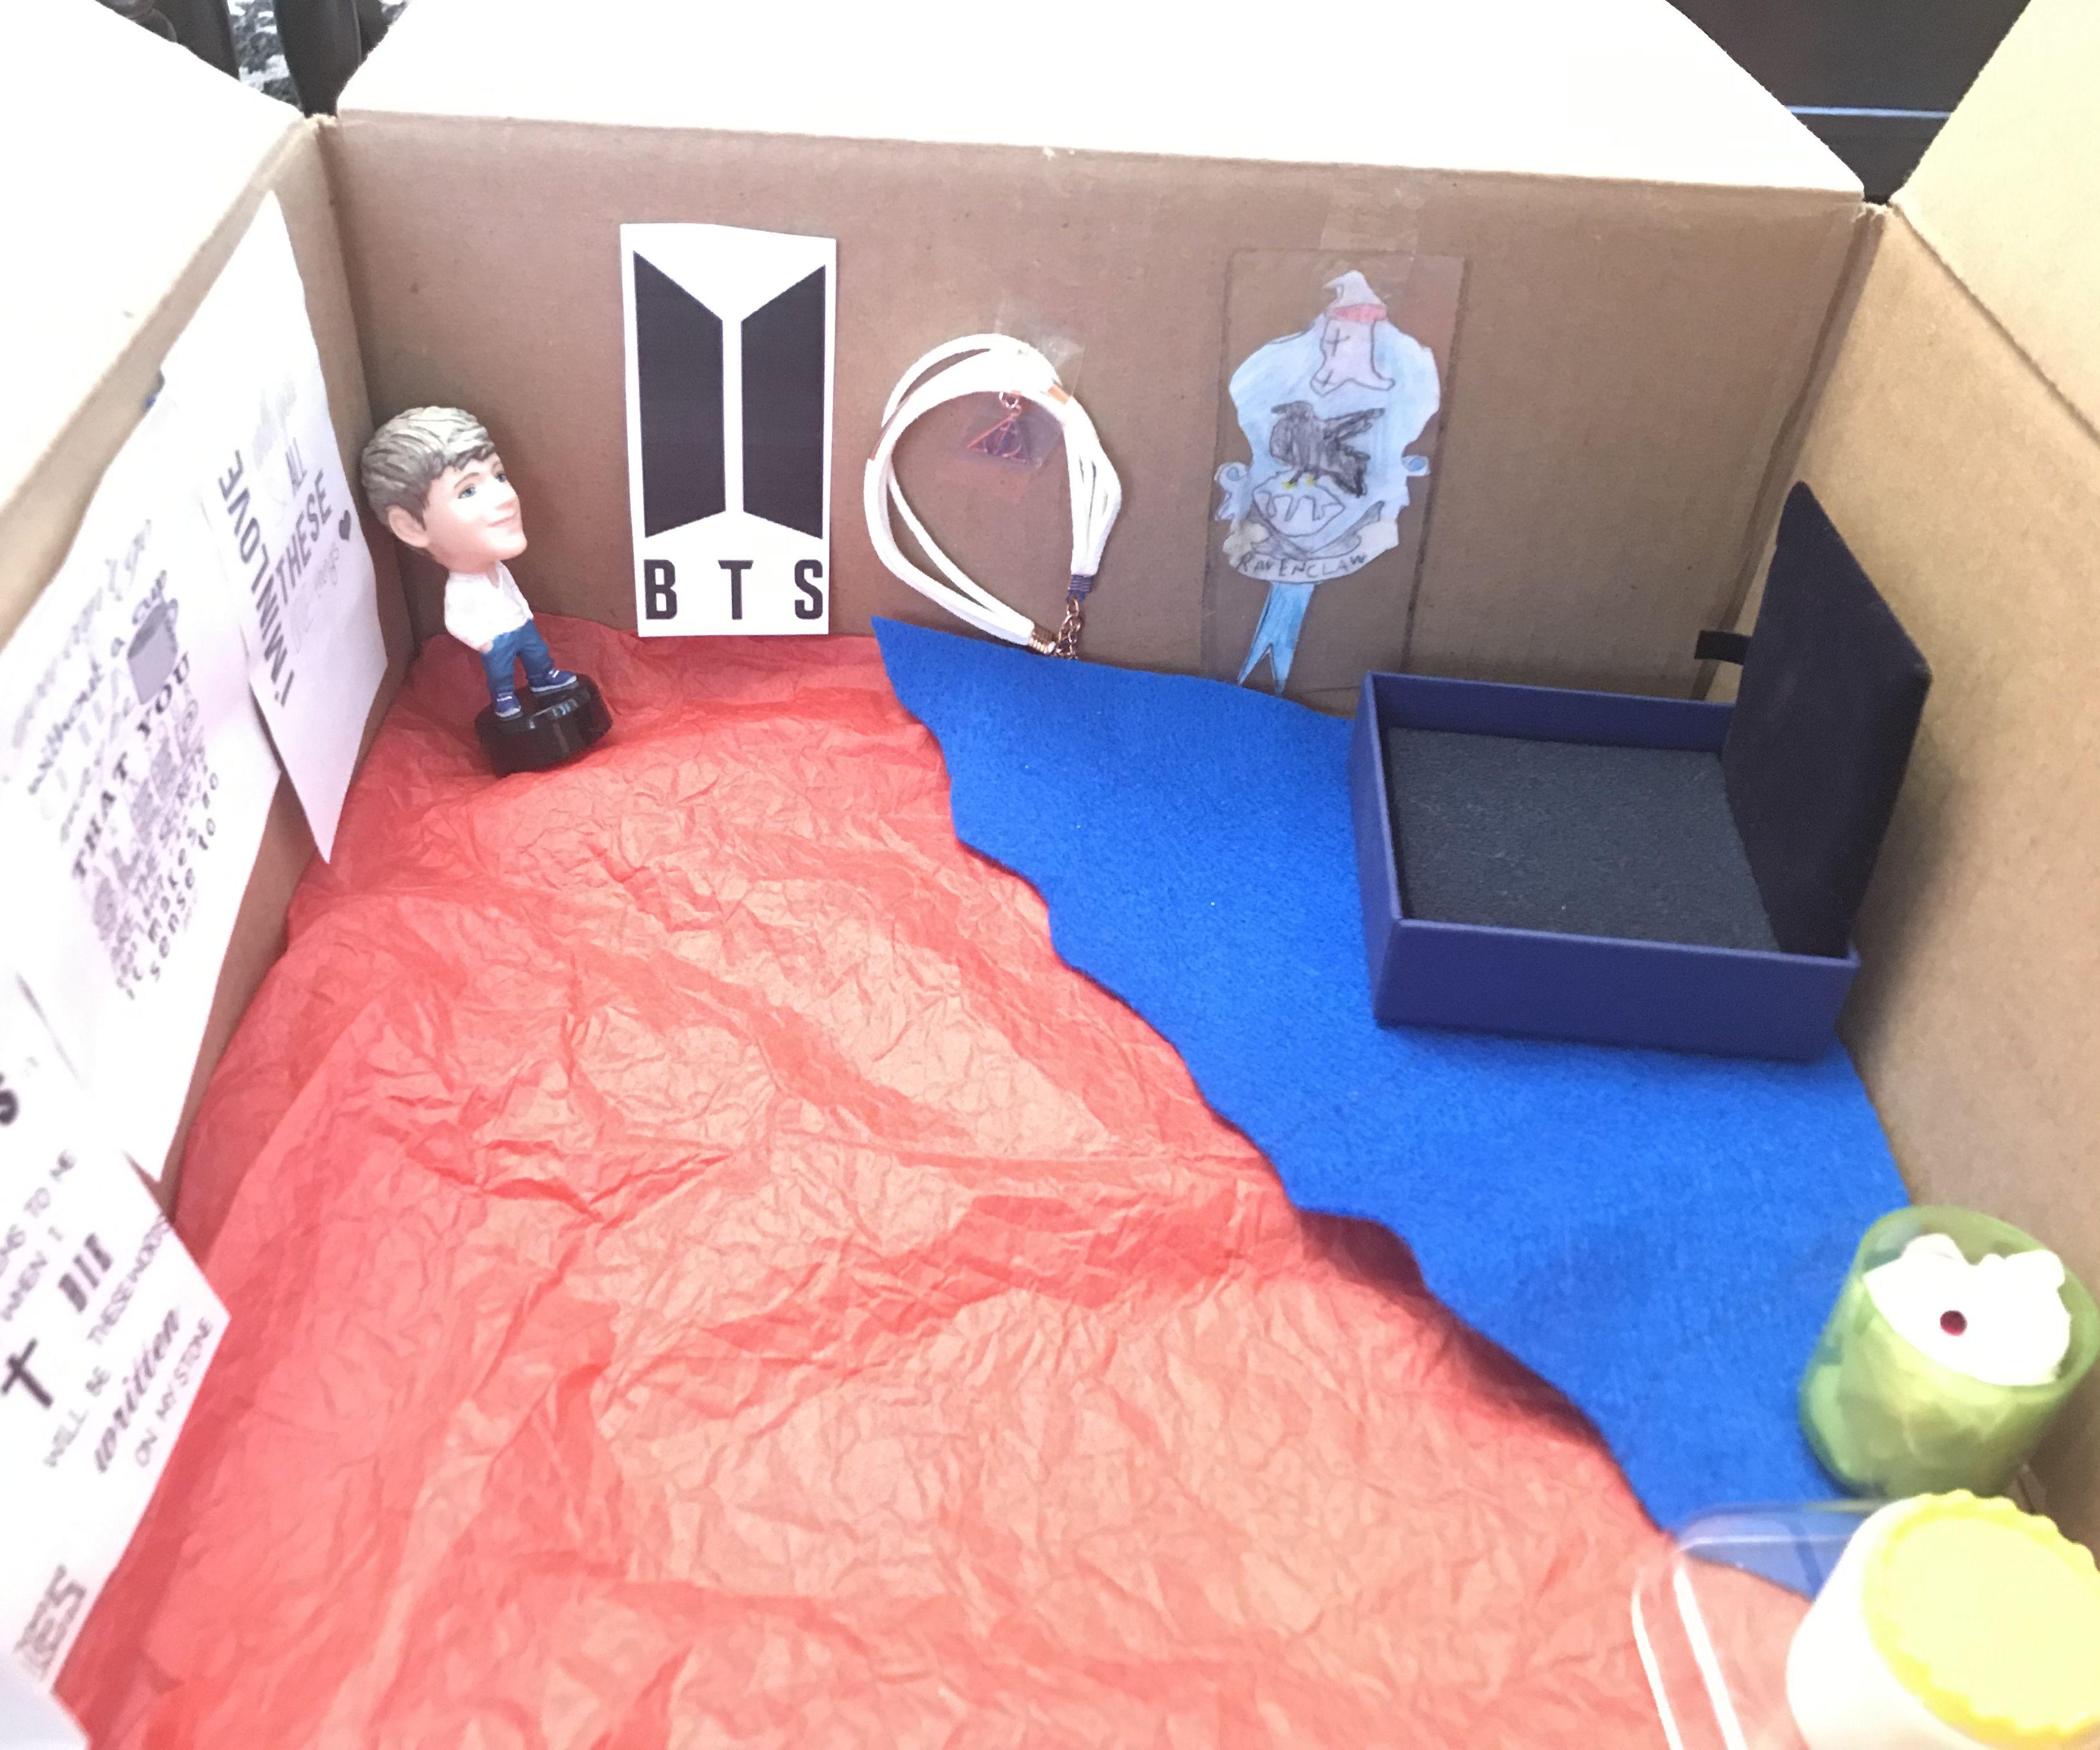 Miniature Fangirl's Bedroom